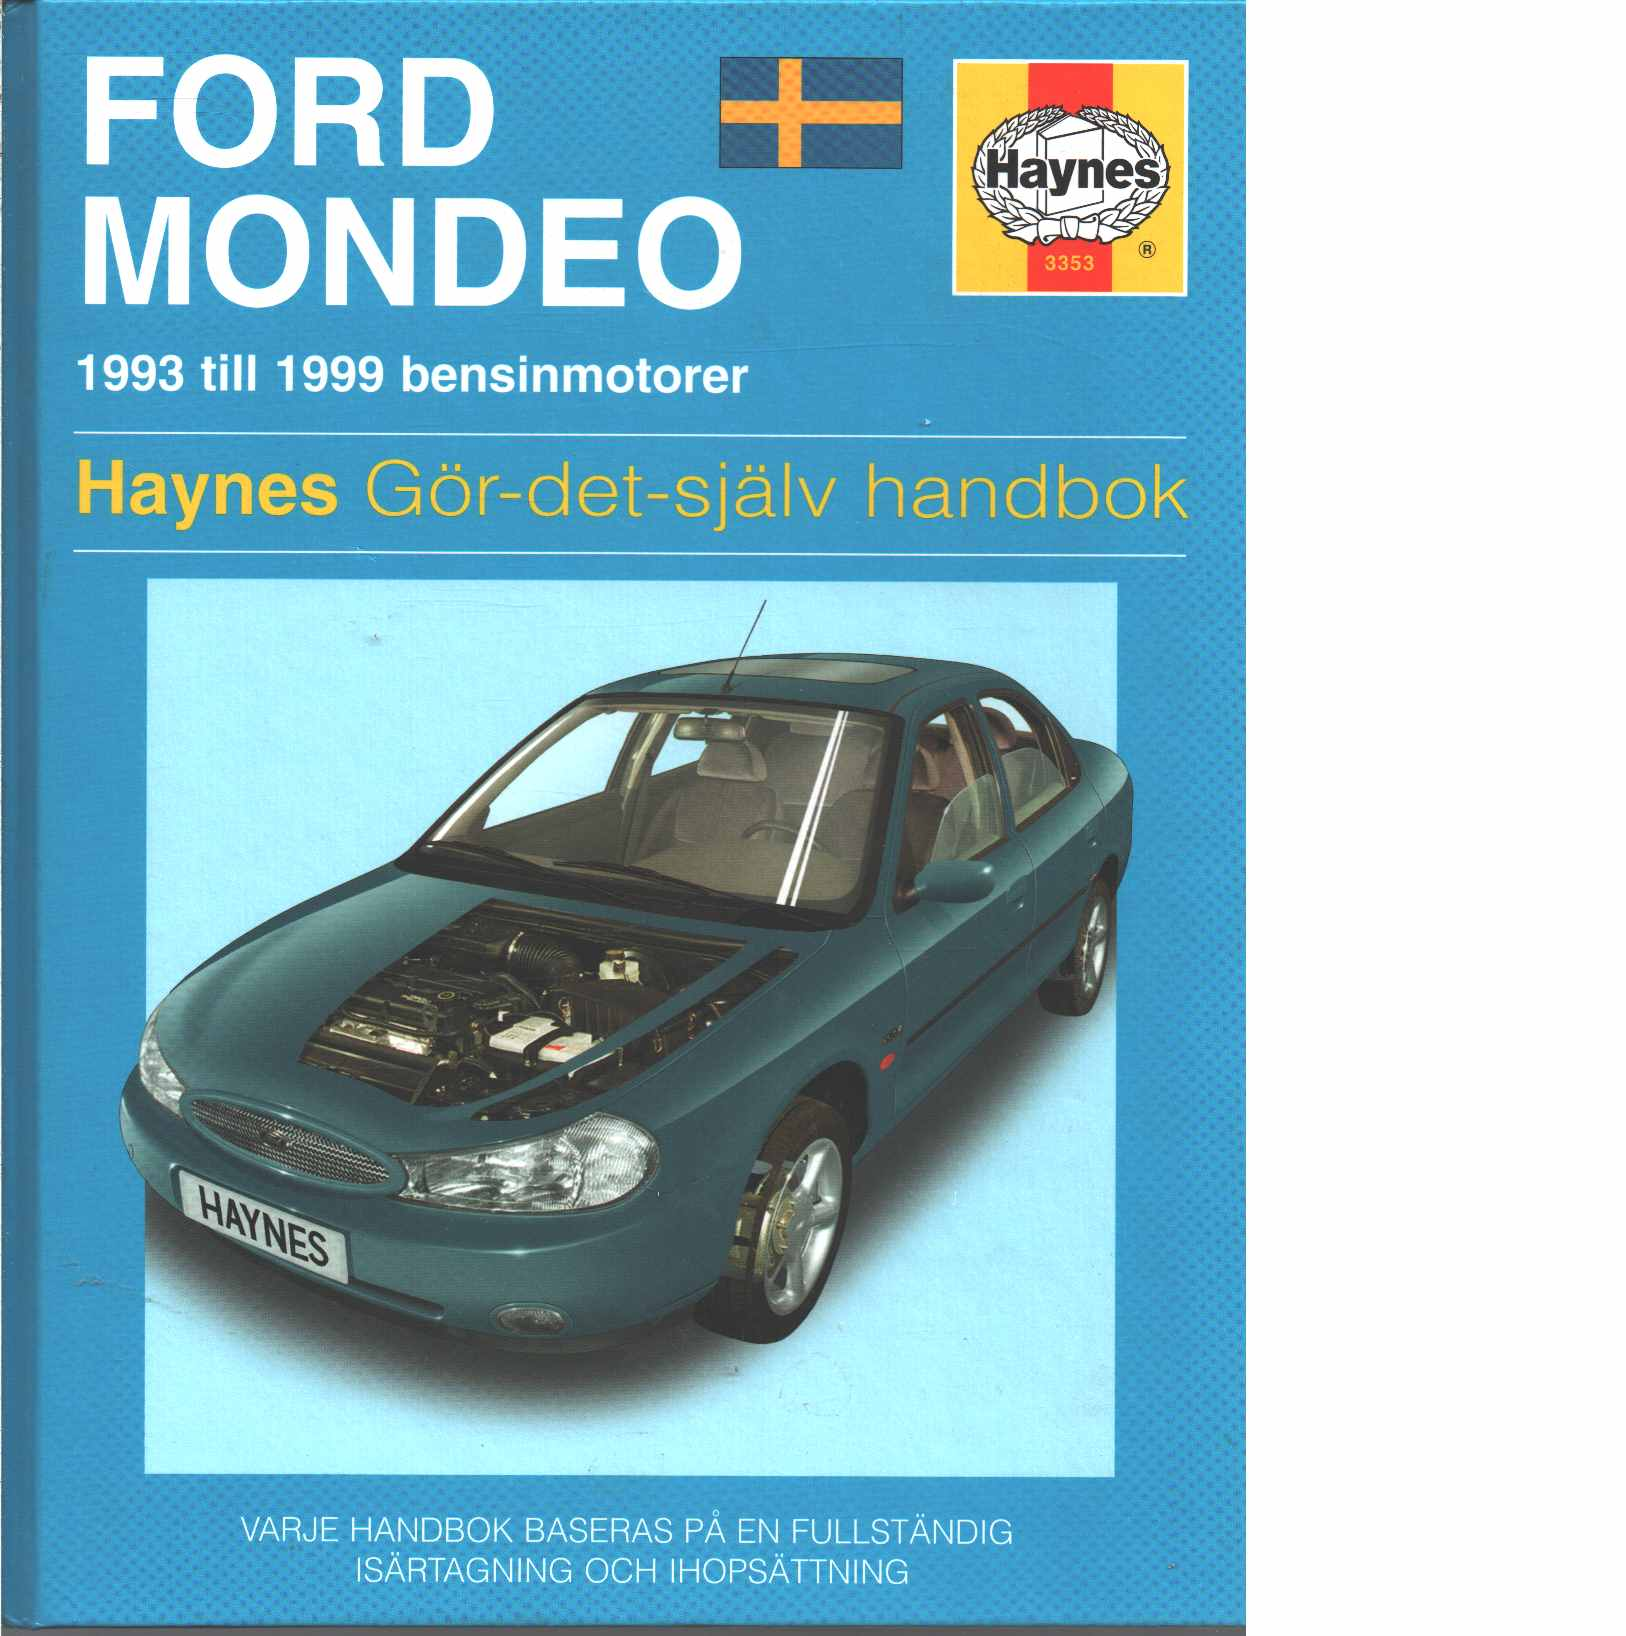 Ford Mondeo : [1993 till 1999 bensinmotorer] - Legg, Andrew K och  Jex, Robert M